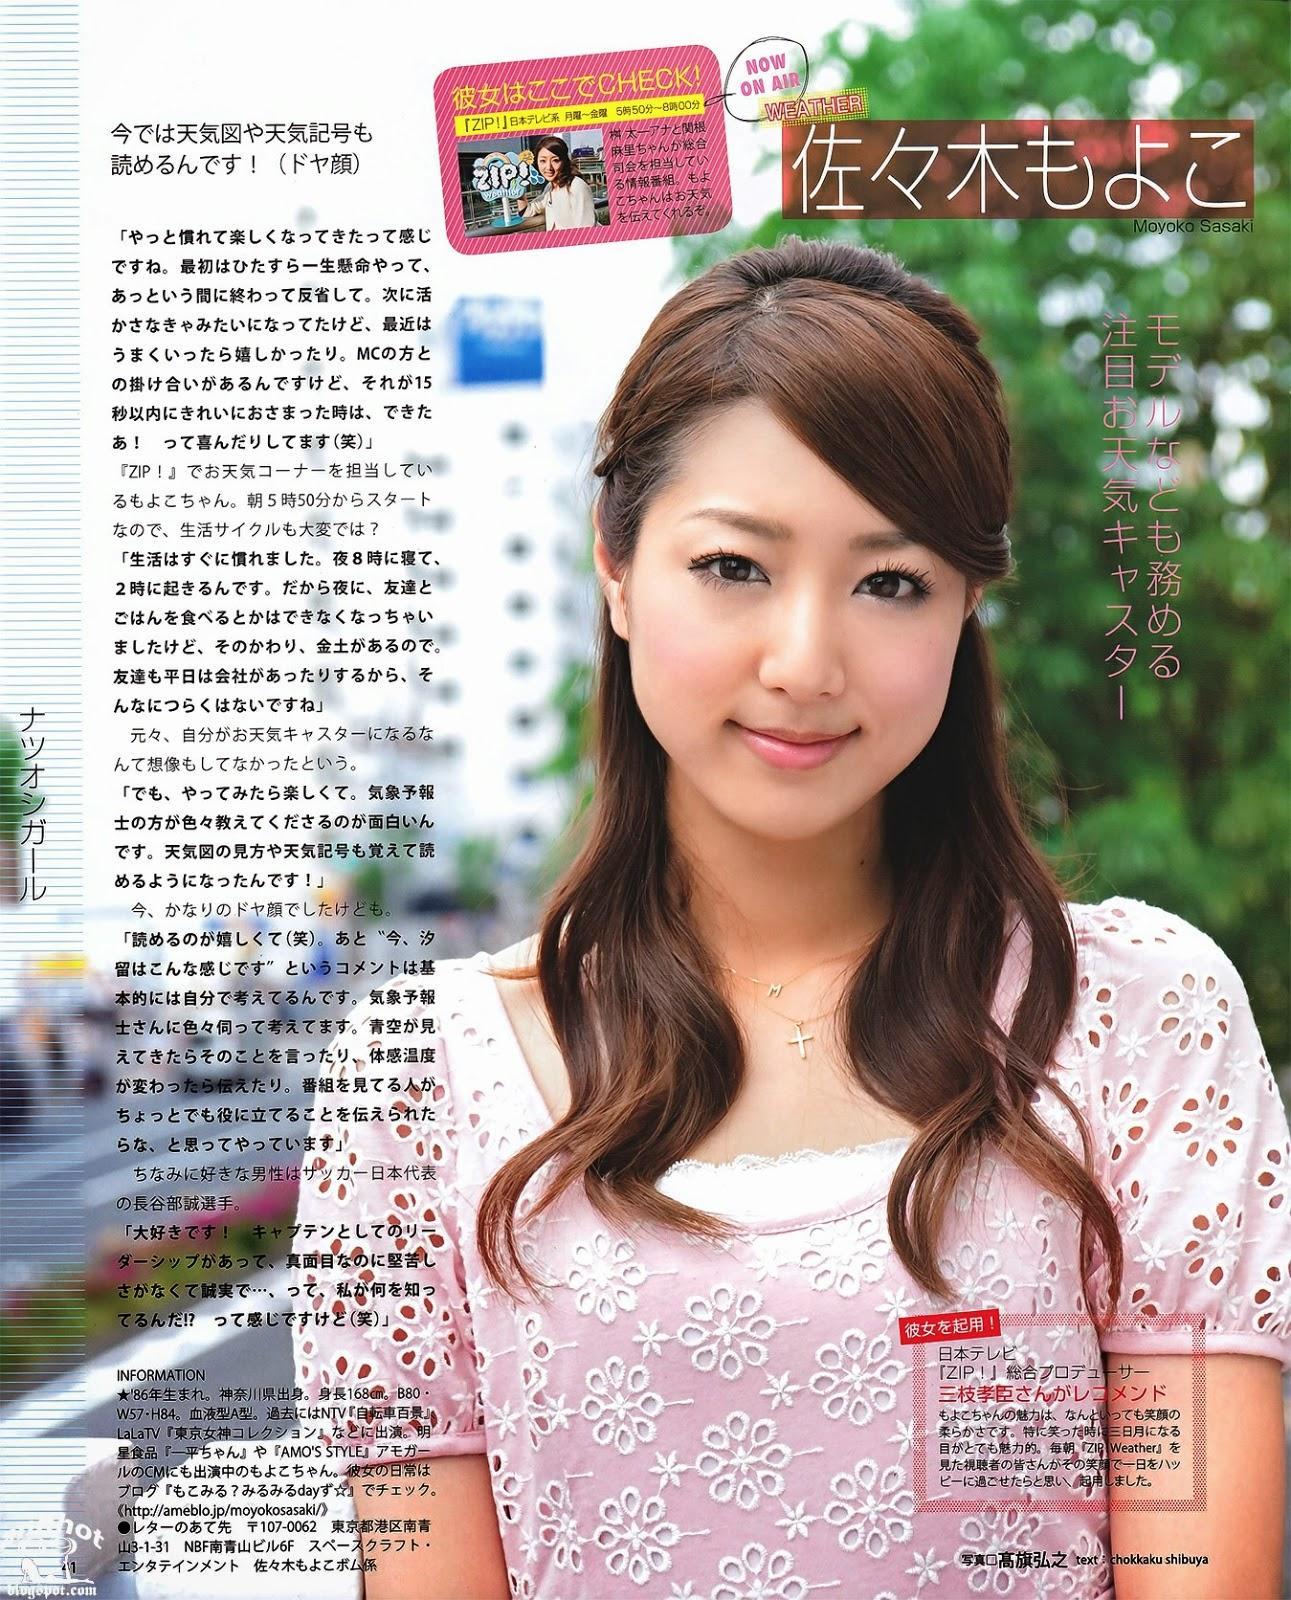 moyoko-sasaki-01333773